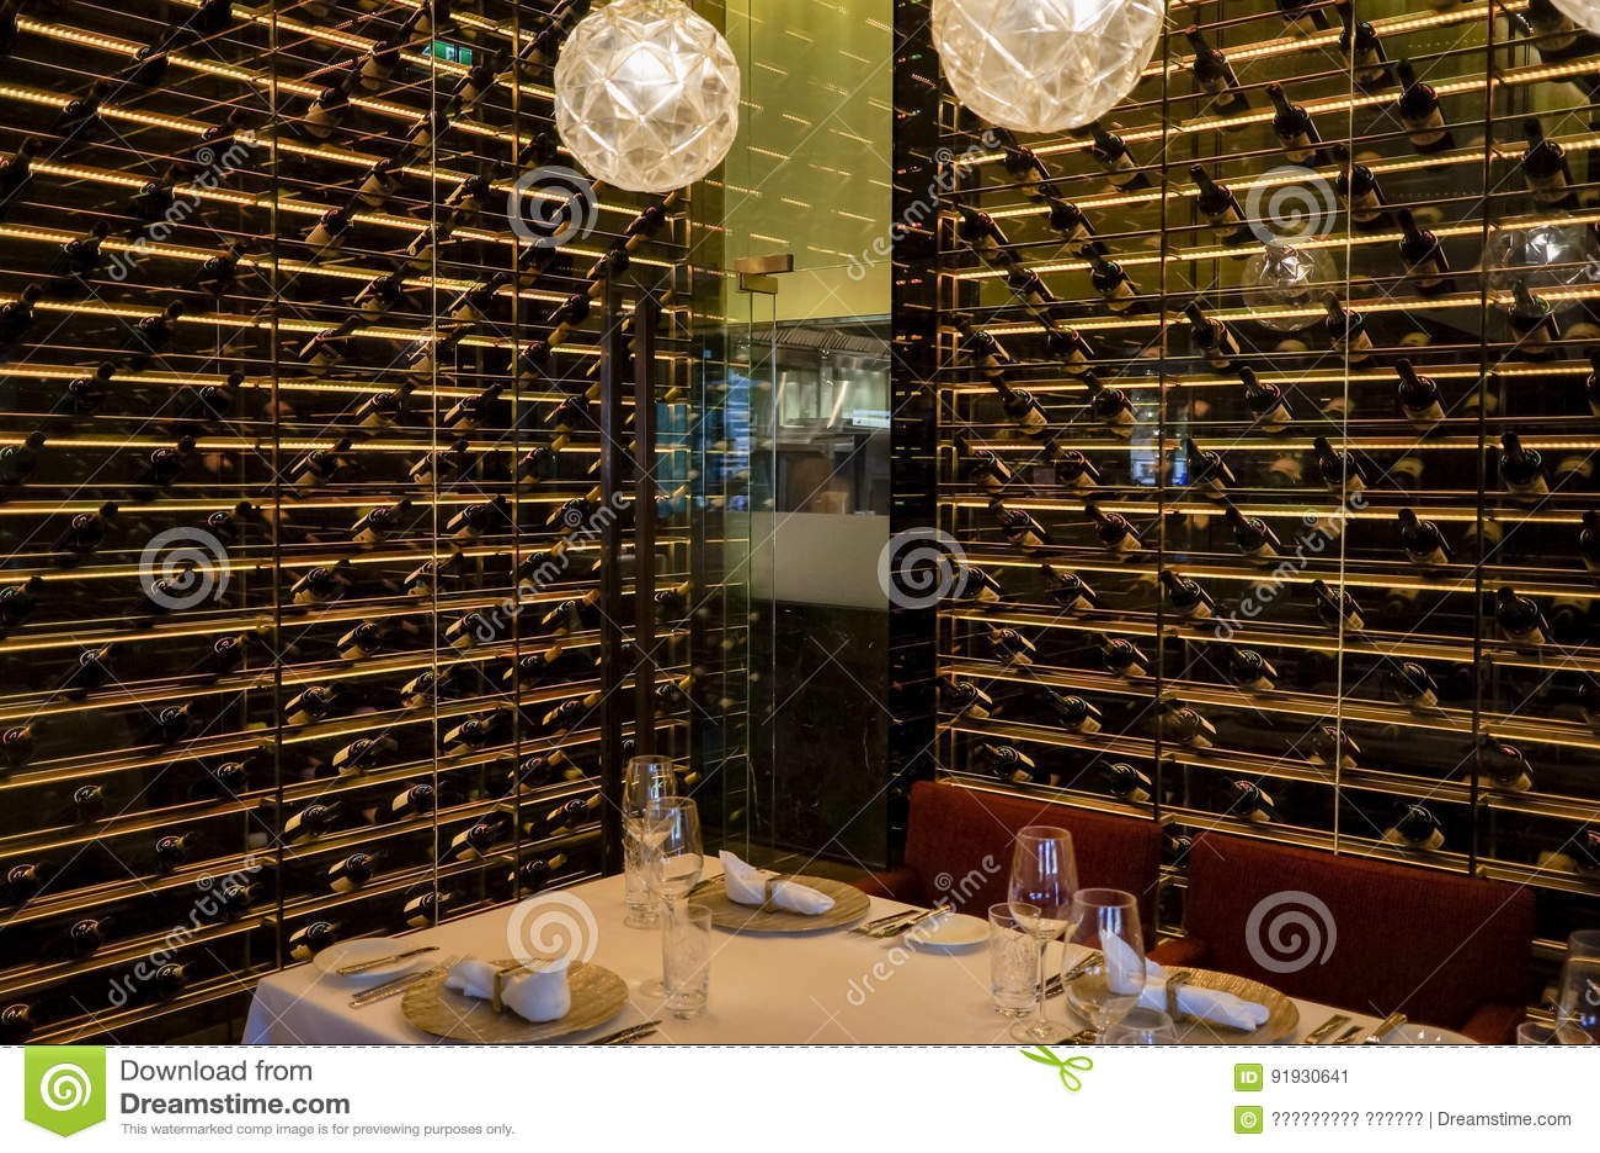 Дубай Лето 2016 Интерьер ресторана Ritz Carlton Абу-Даби вина